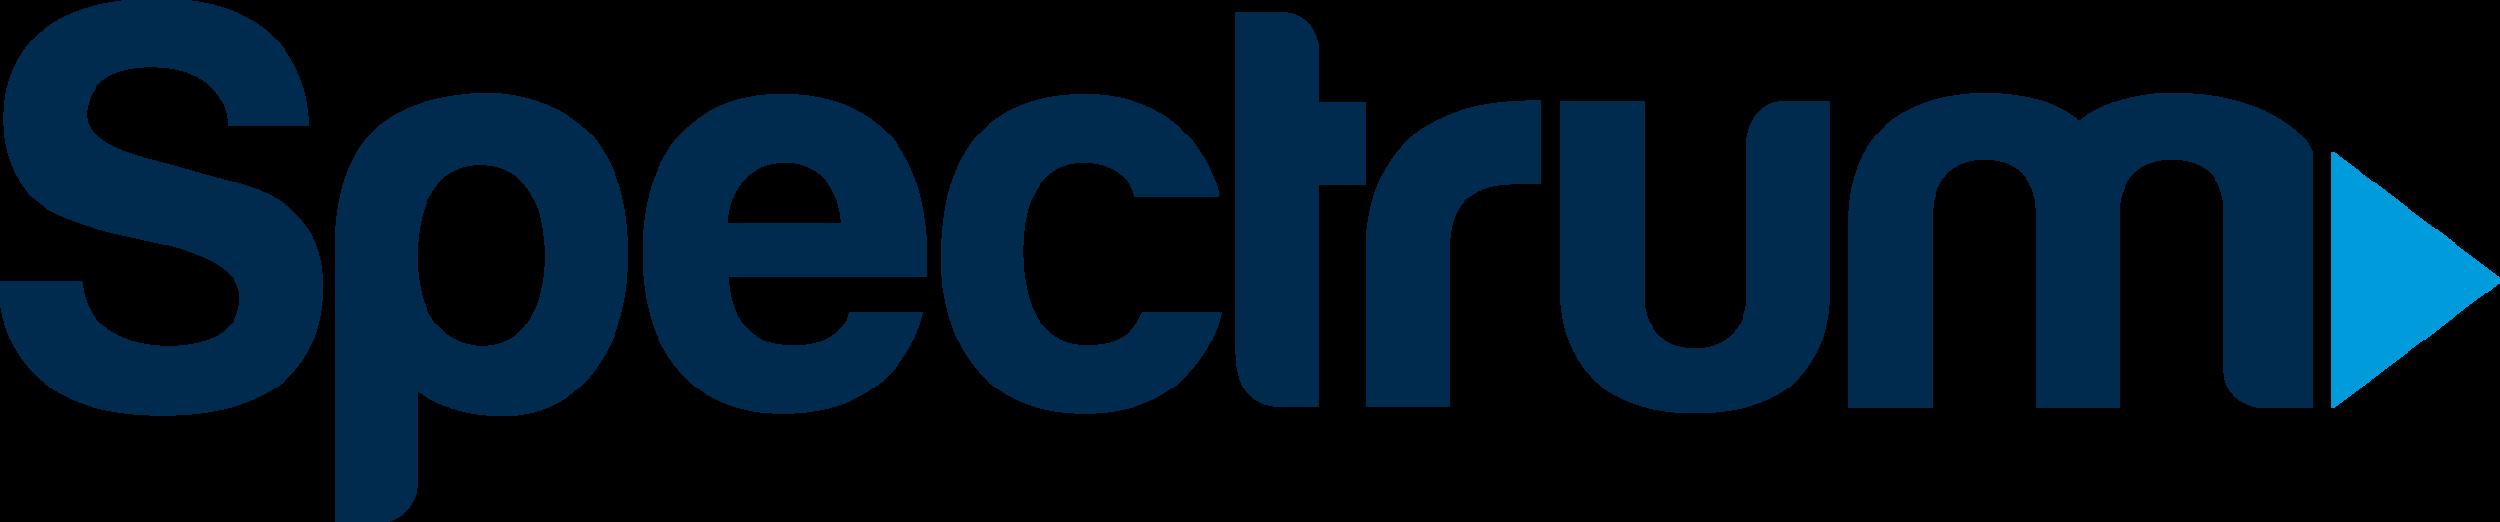 Spectrum_Logo_DBlue.png